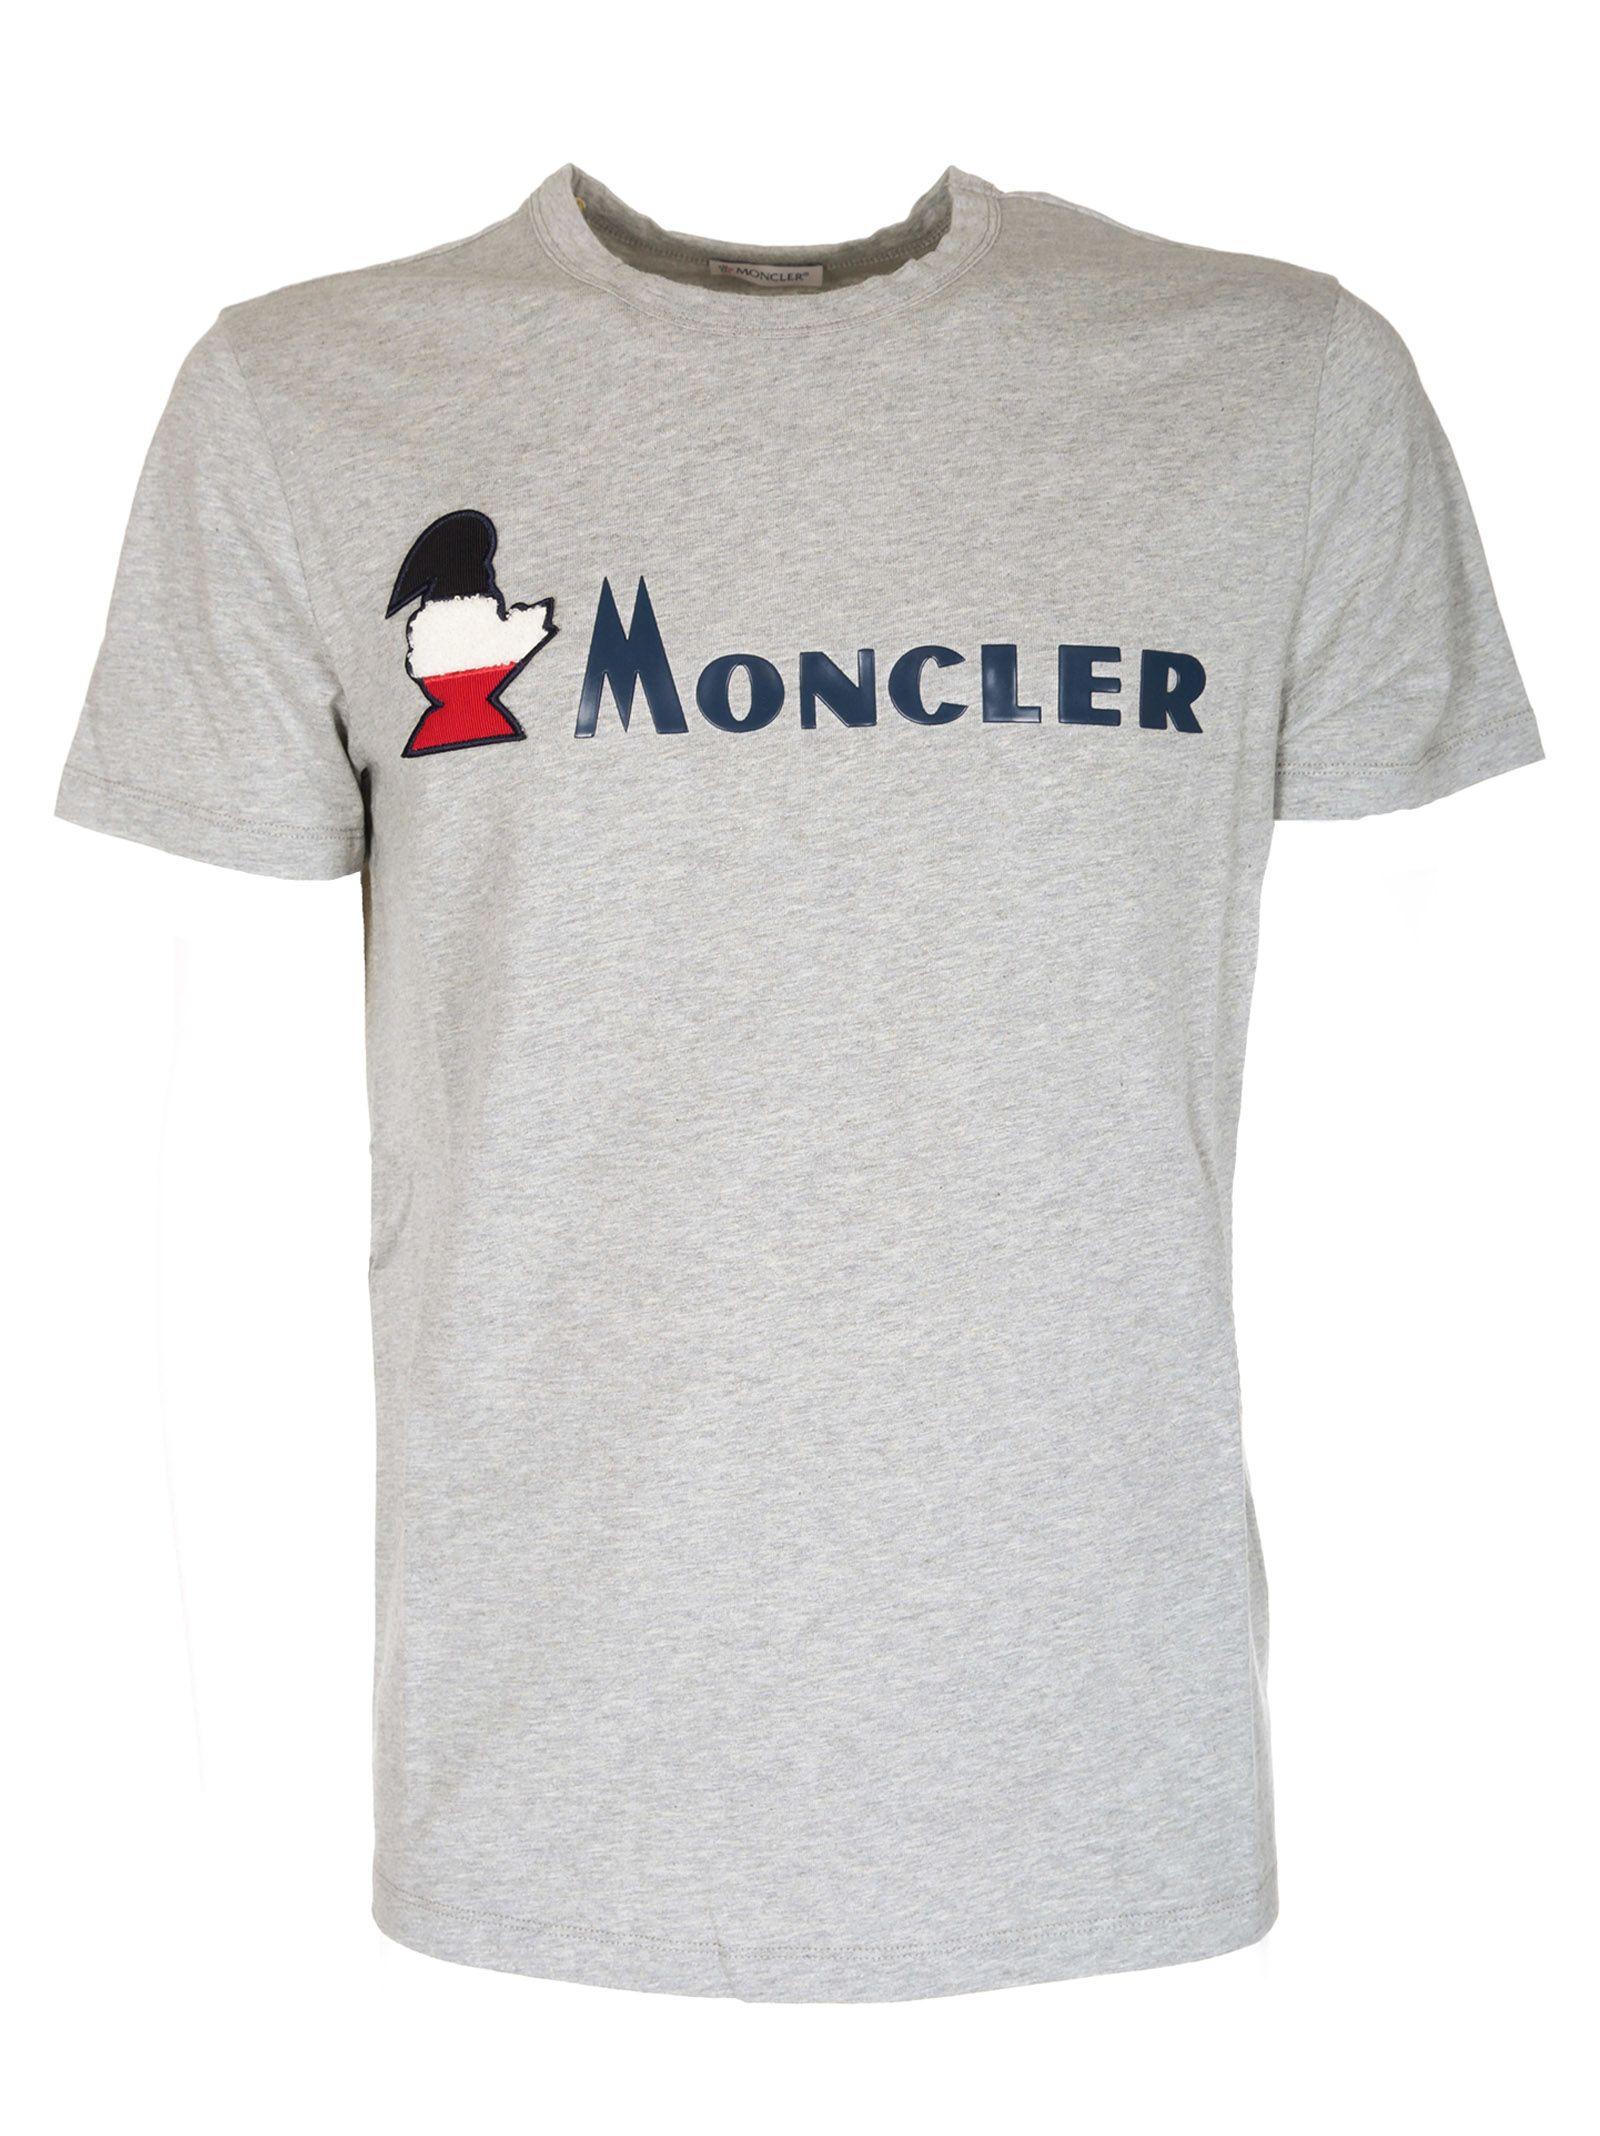 cee344b7998c Moncler Moncler Logo Print T-shirt - Basic - 10839851